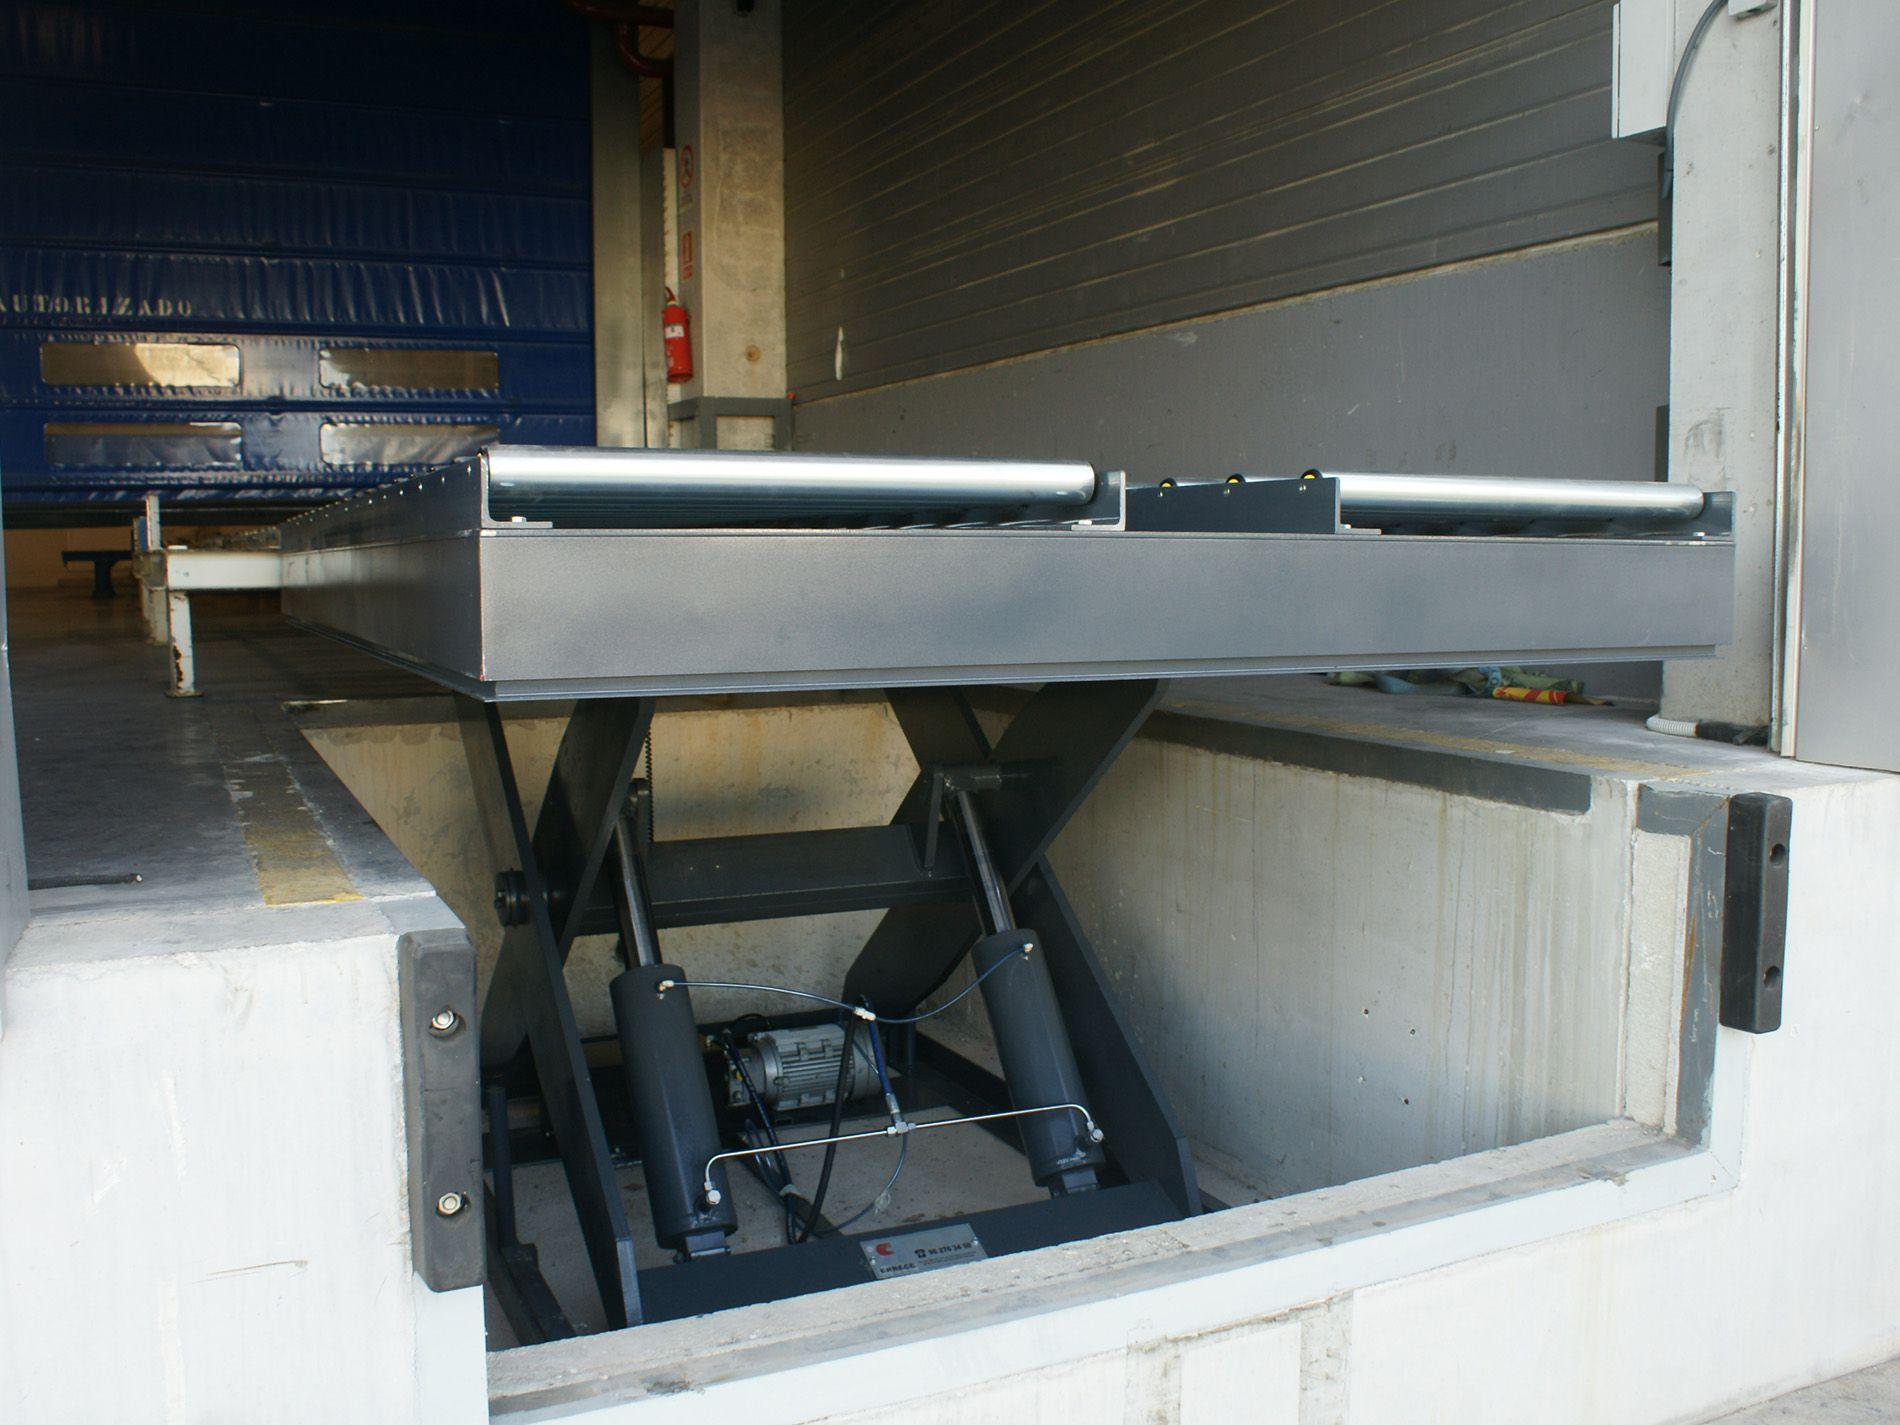 Mesas elevadoras para sistemas de carga